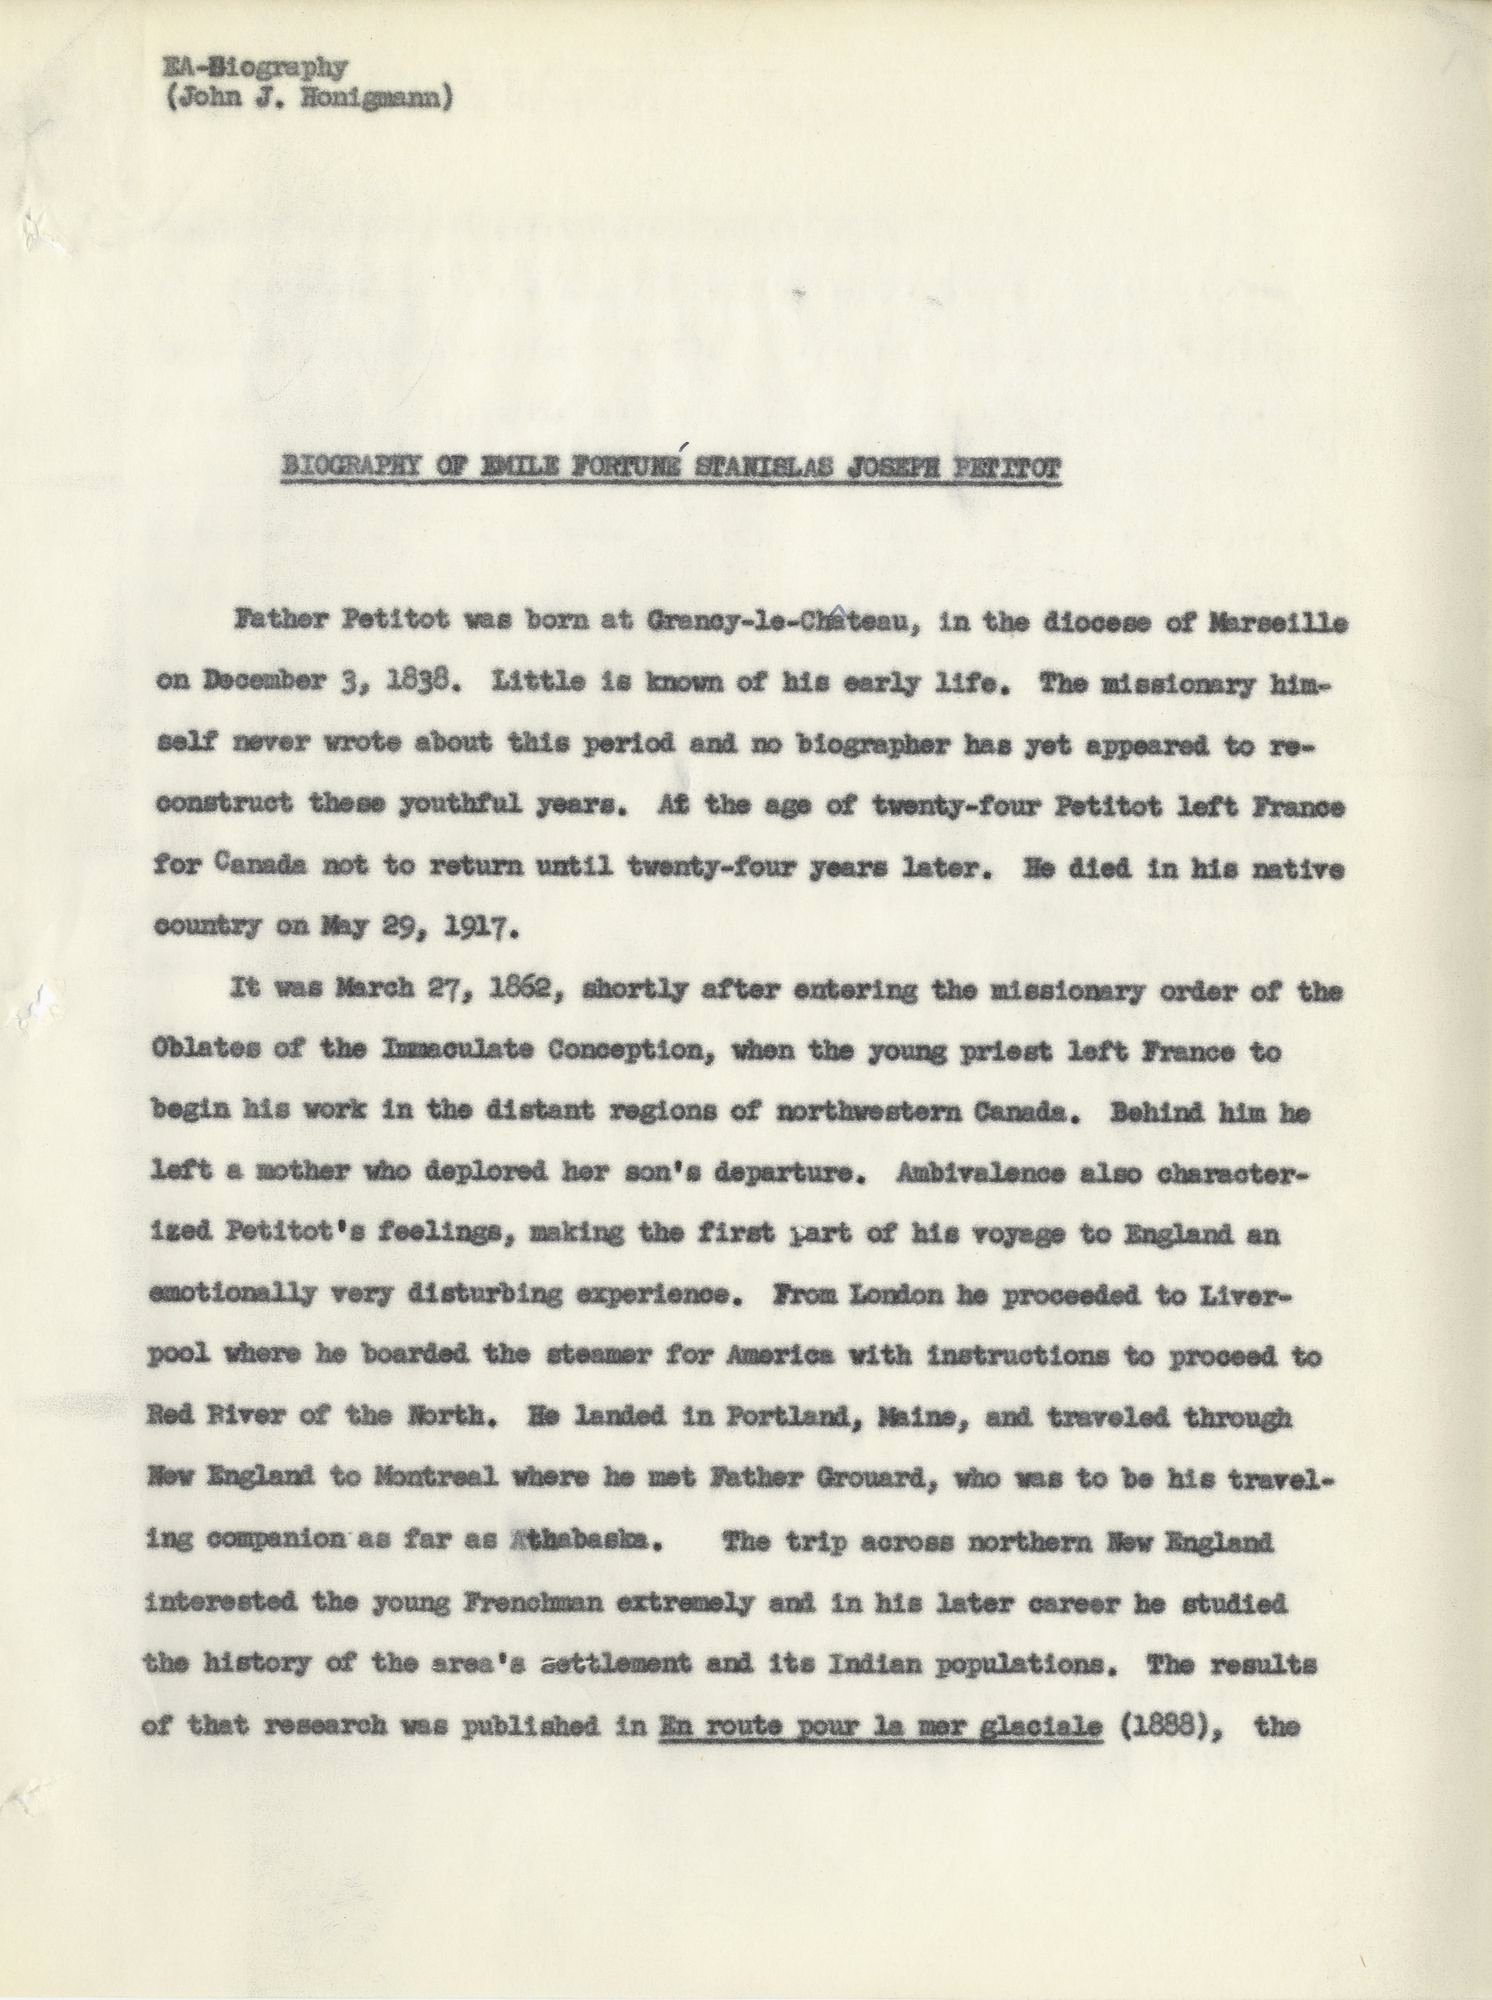 Late Letter Of Recommendation Fresh Emile fortuné Stanislas Joseph Petitot Encyclopedia